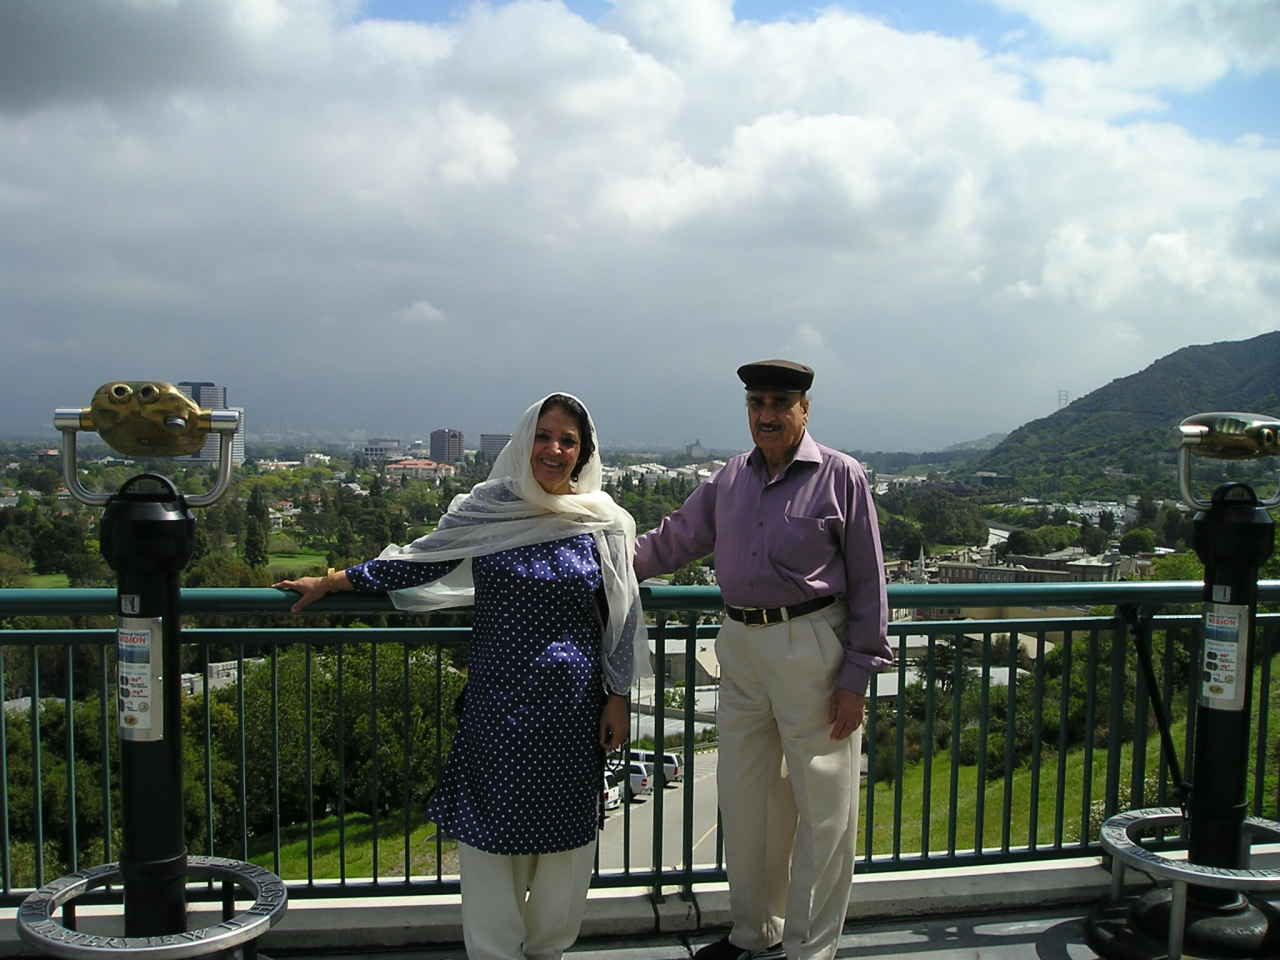 http://1.bp.blogspot.com/-ai6C2tDhZHQ/TgX60mzTvZI/AAAAAAAABOU/yllDxelnvHo/s1600/Abbottabad%20City%20Photos%20%284%29.JPG